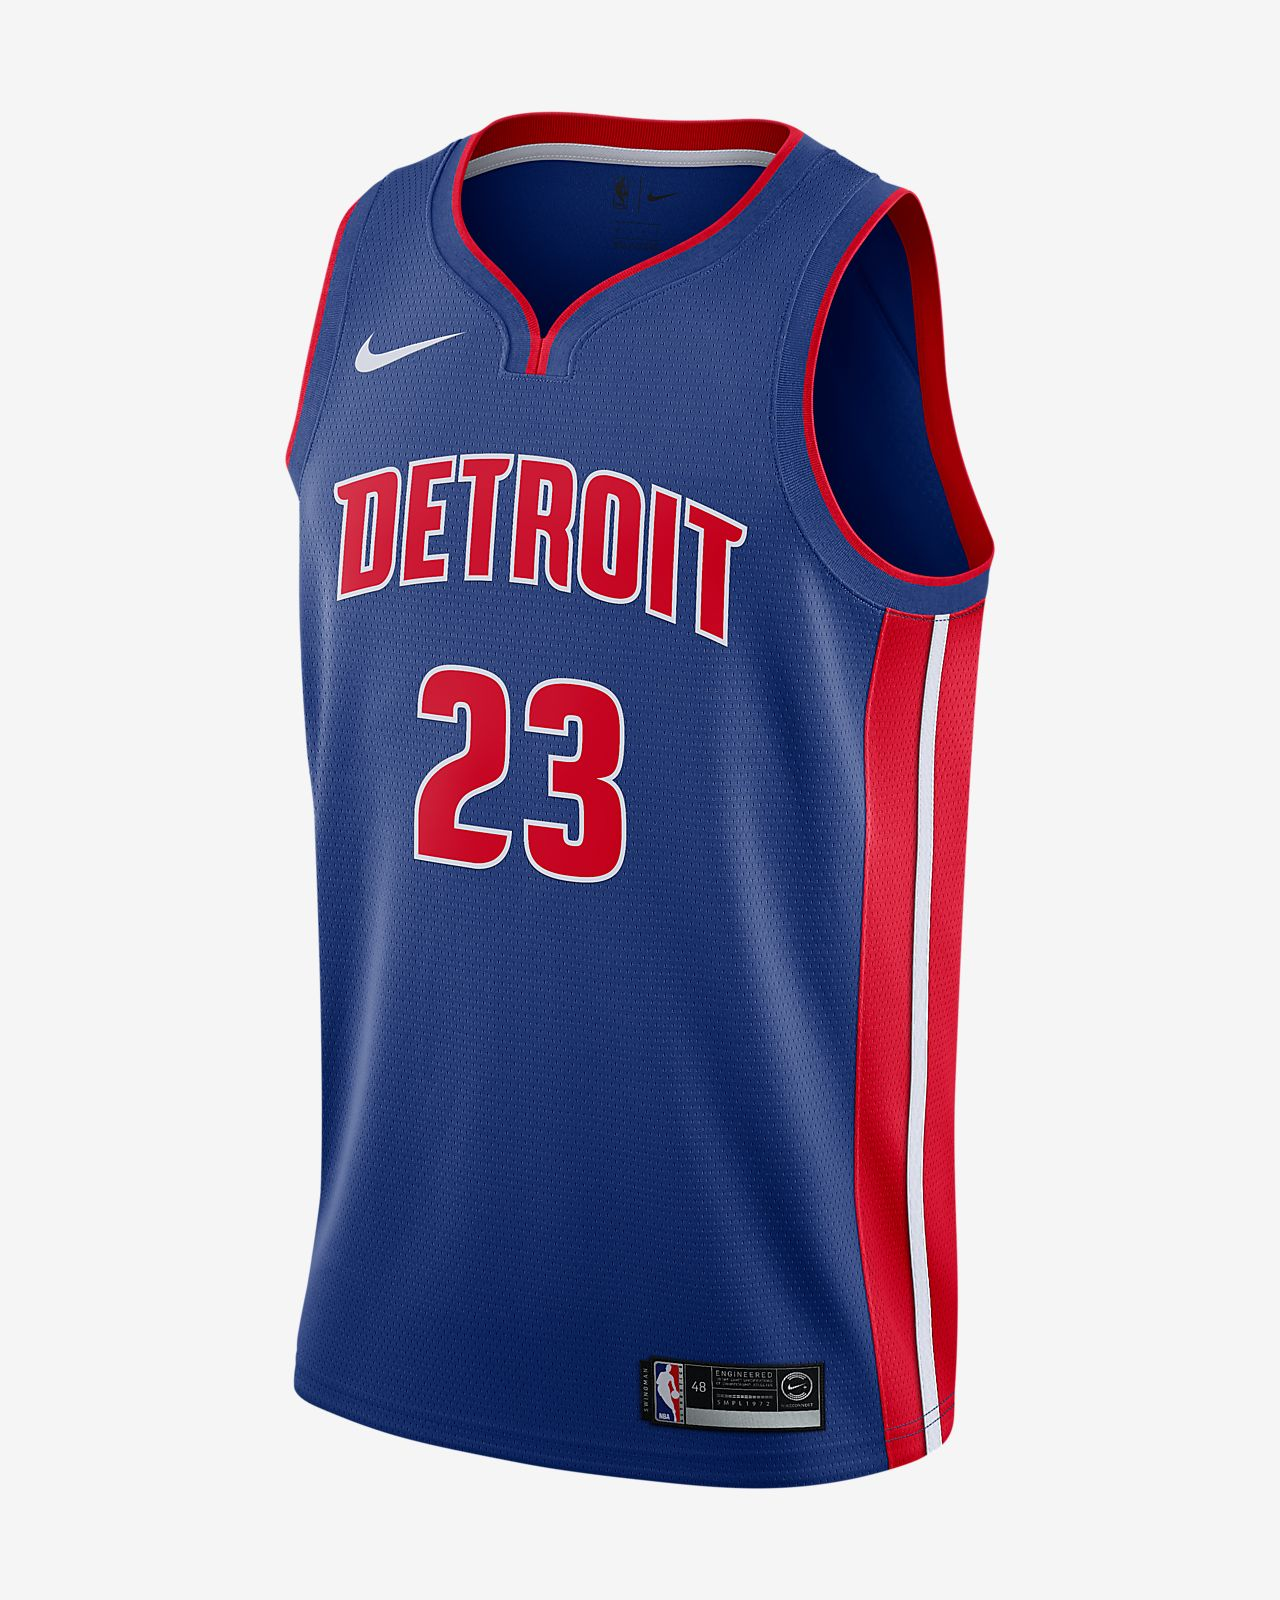 Мужское джерси Nike НБА Blake Griffin Icon Edition Swingman (Detroit Pistons) с технологией NikeConnect